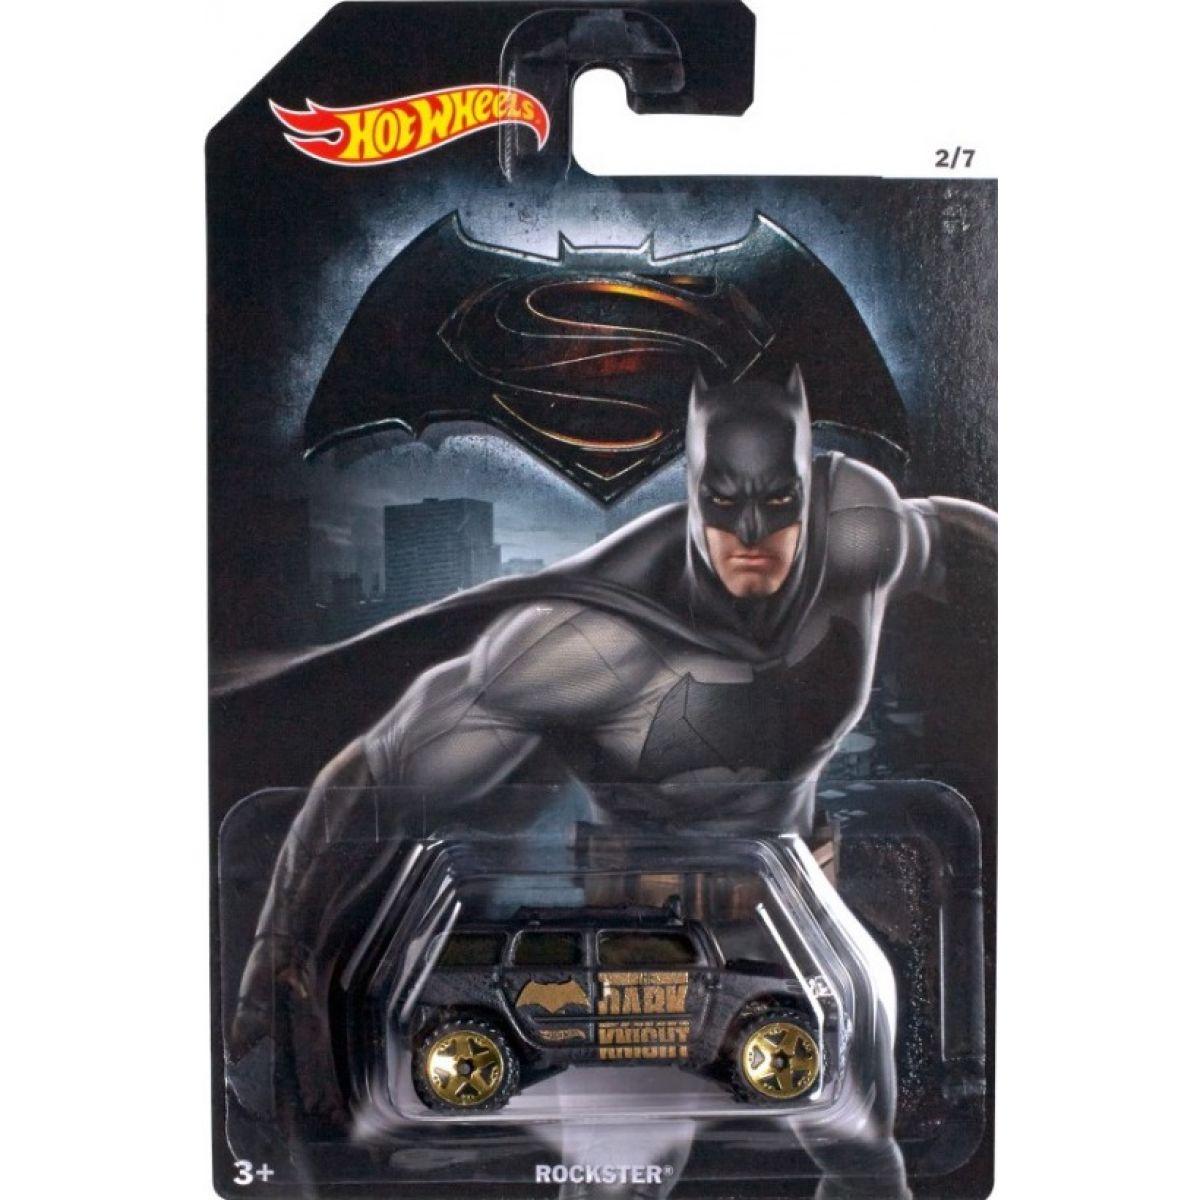 Hot Wheels Batman vs Superman Angličák - Rockster